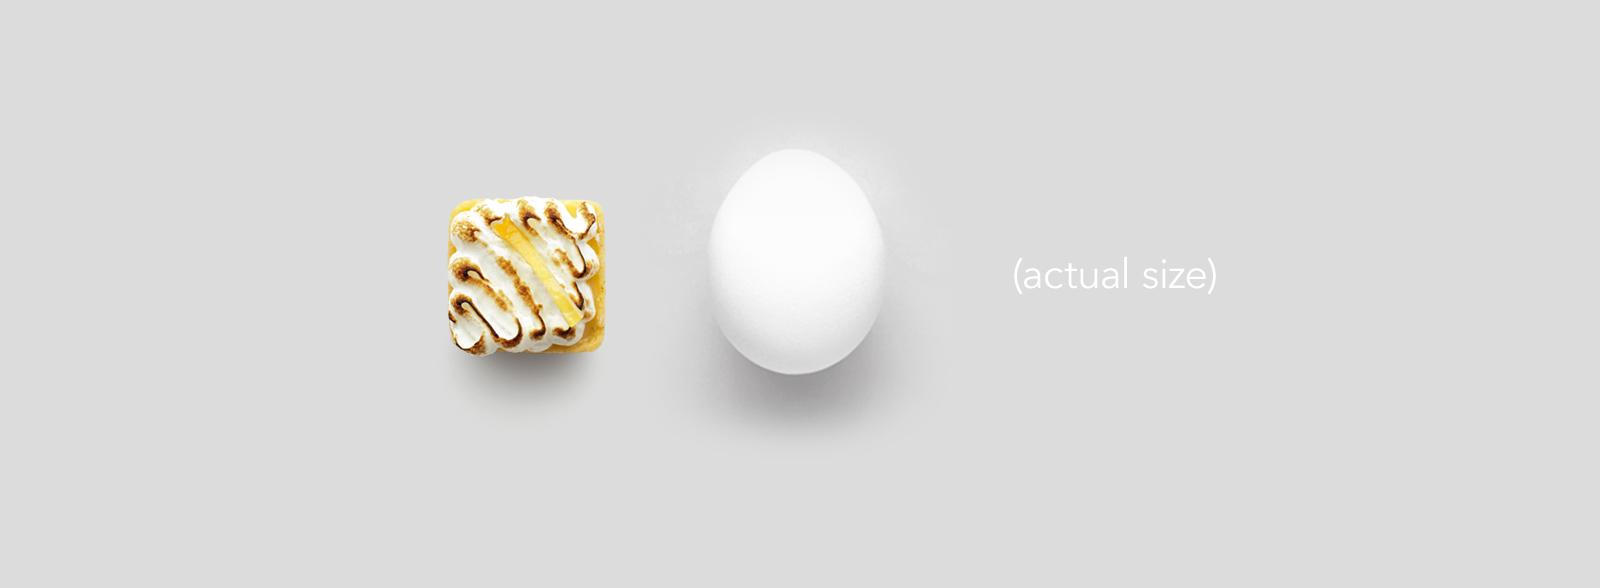 los angeles bakery | fruute - tarts unordinary